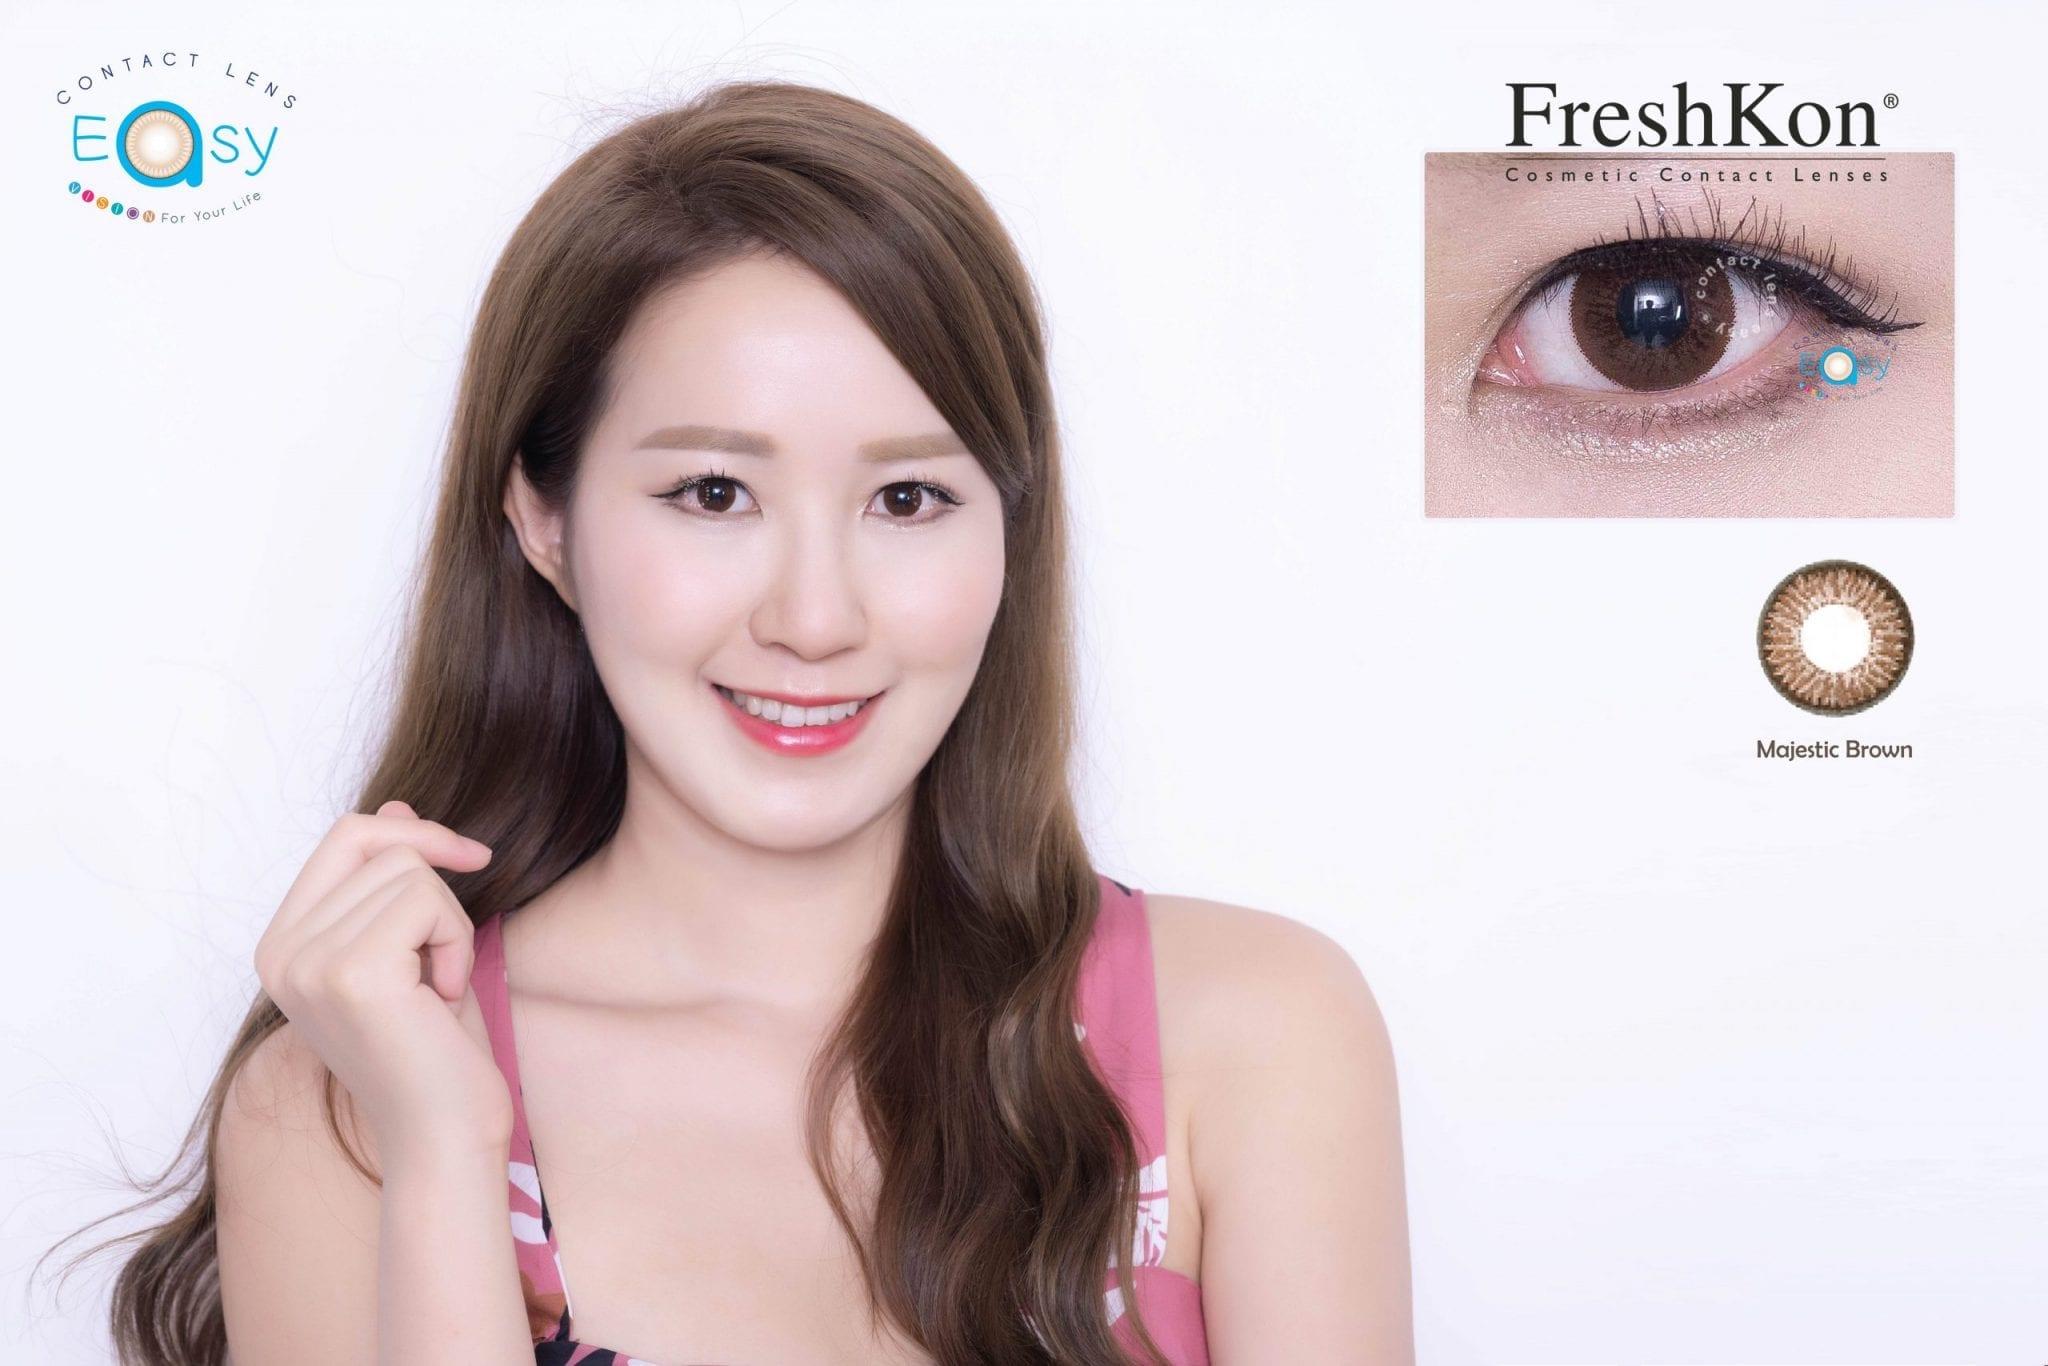 Freshkon Alluring Eyes 大美目 1 Day - Winsome Brown (原盒環保裝)_info2